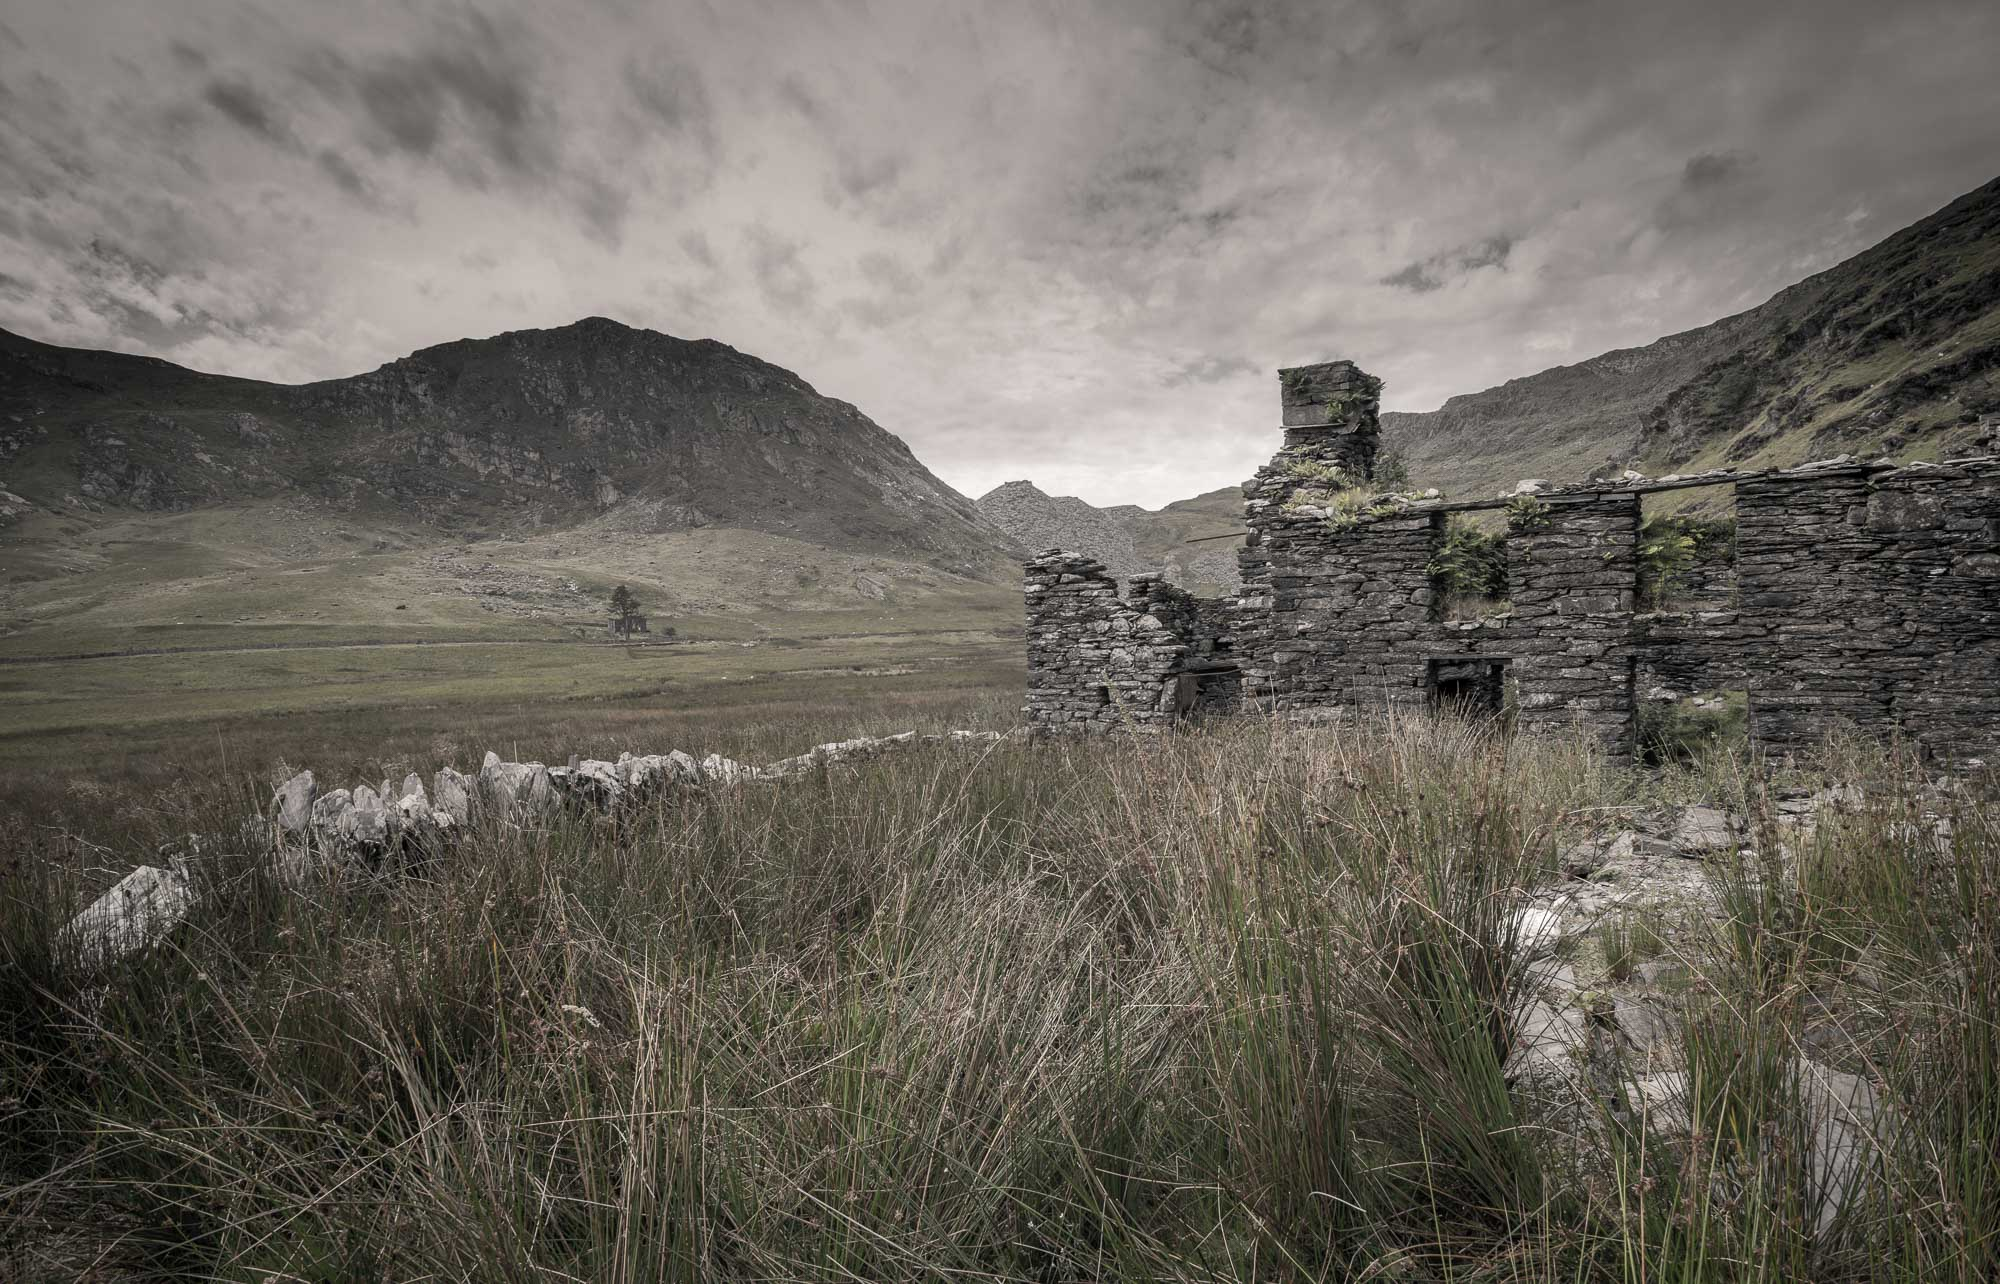 Ruined slate house with mountain